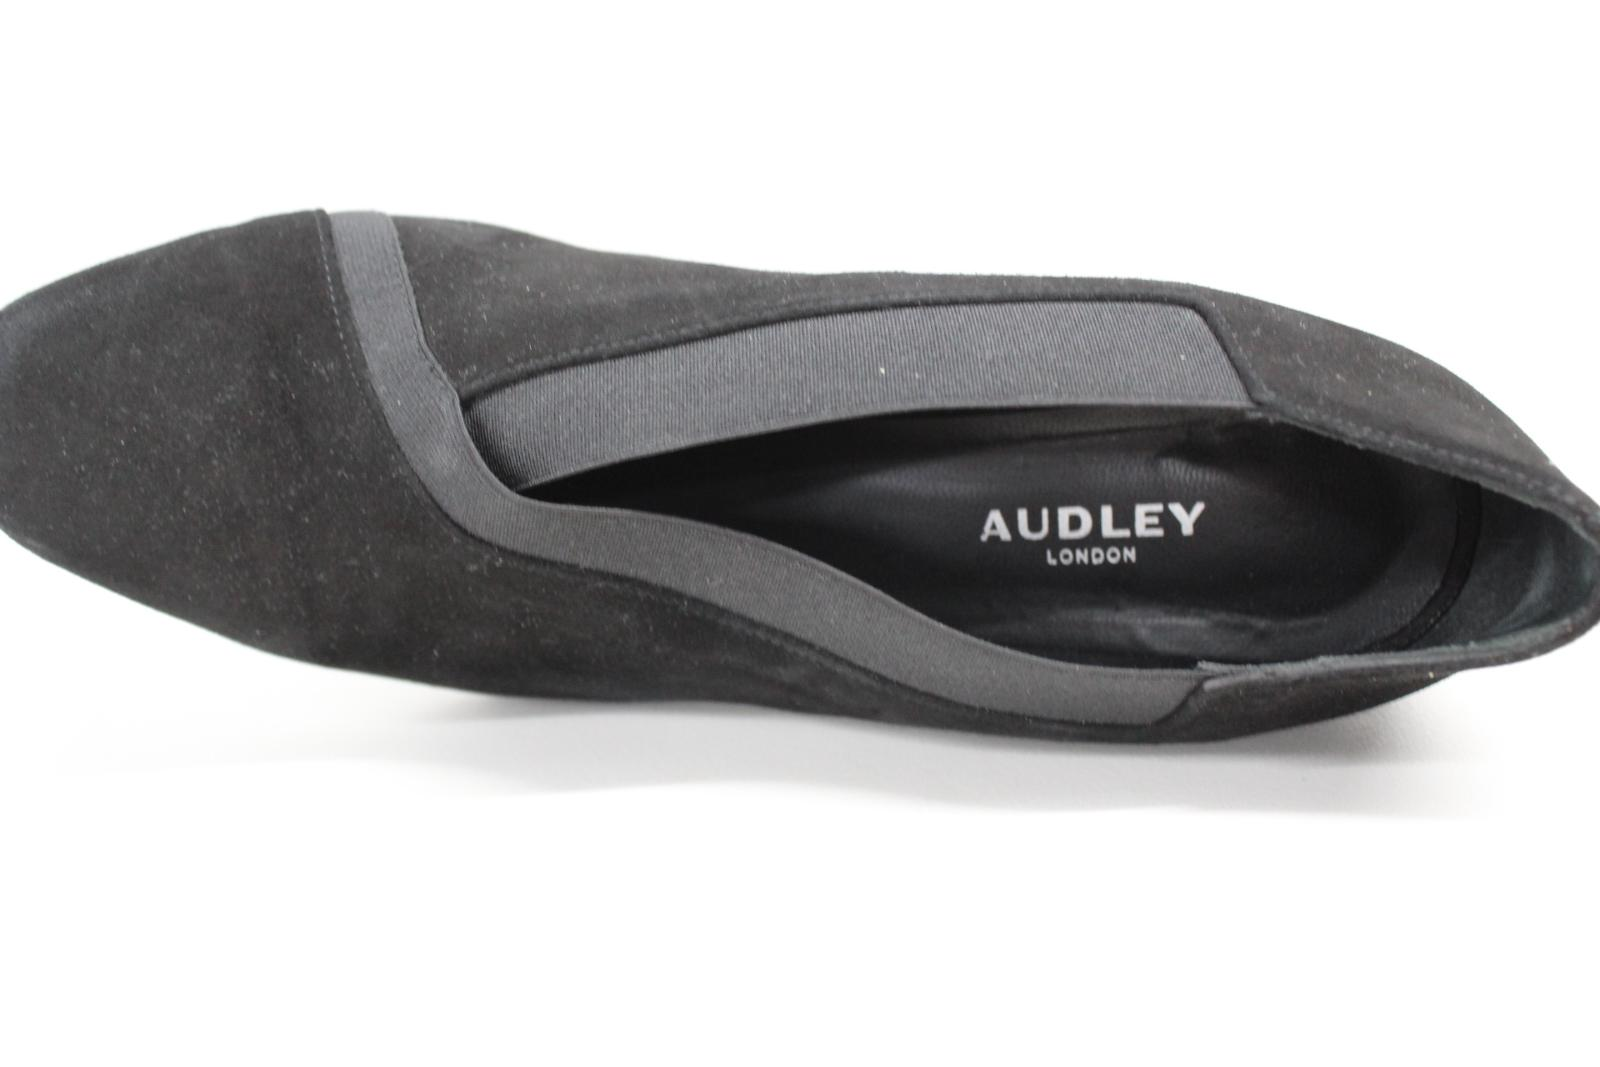 AUDLEY-London-Ladies-Black-Suede-Crossover-Block-Heels-Shoes-Size-EU39-UK6 thumbnail 6